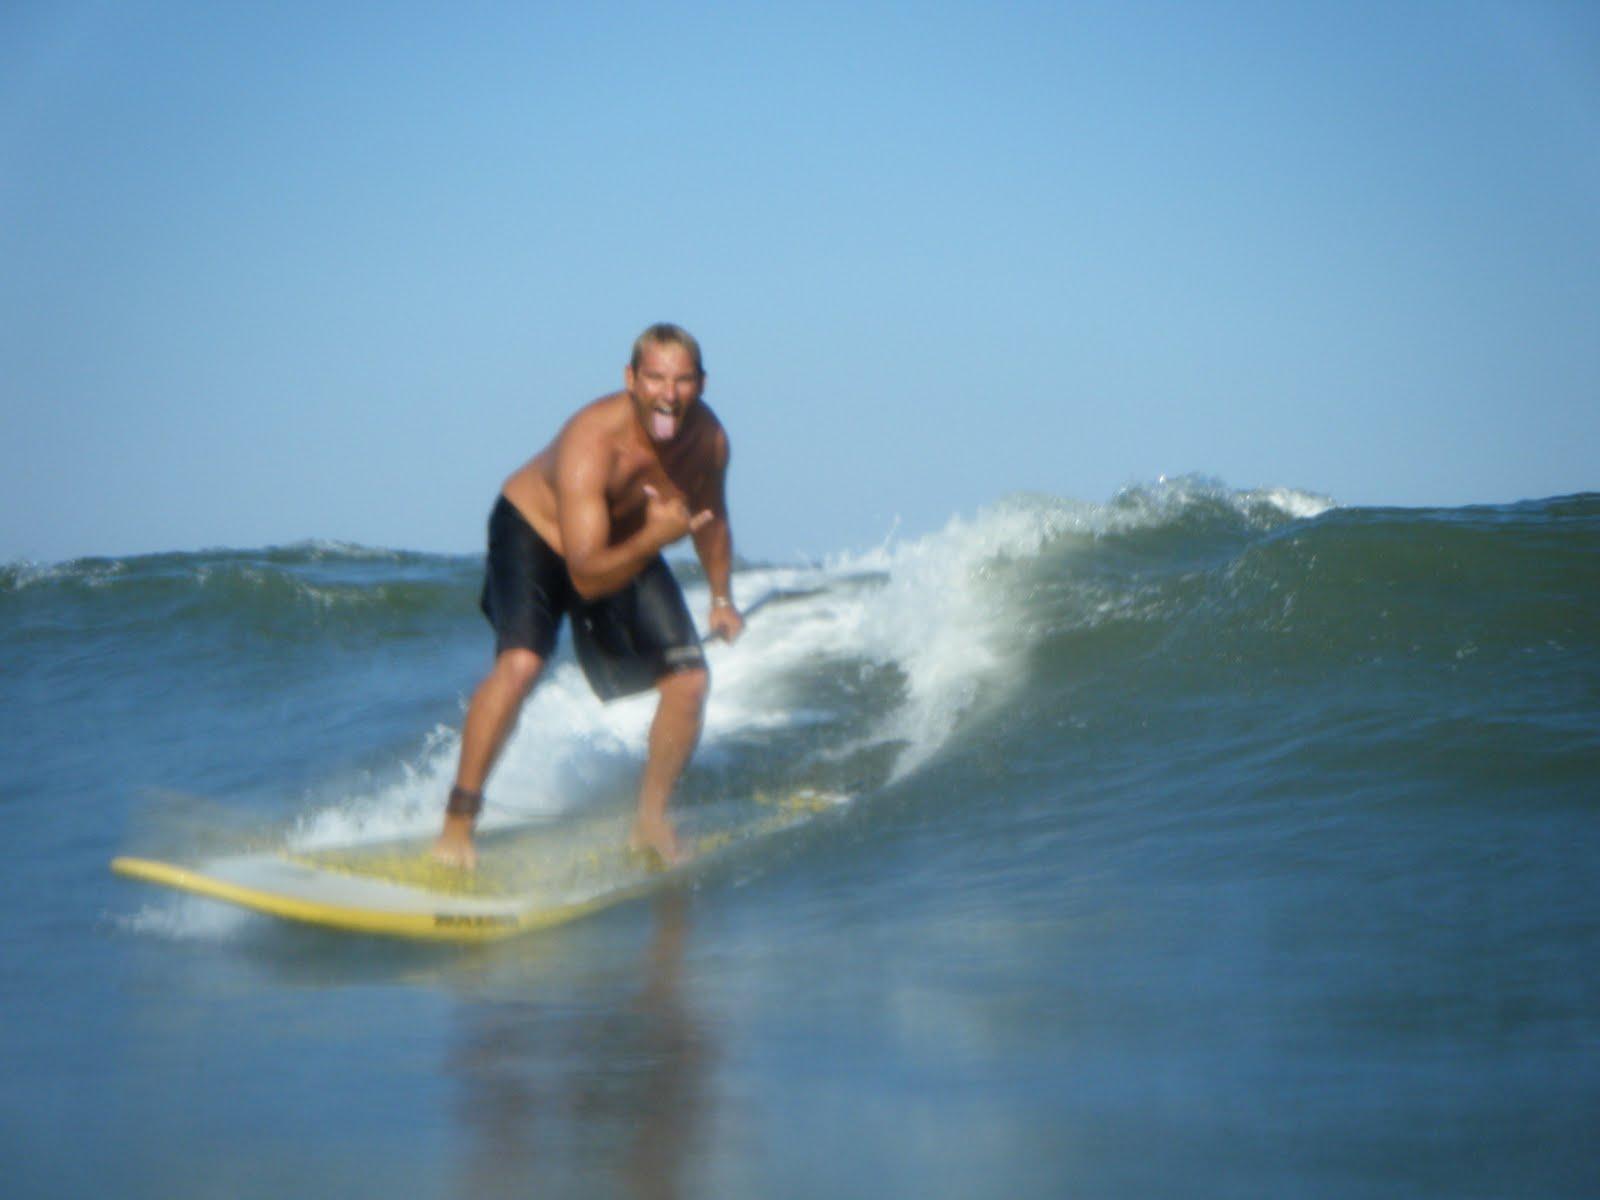 atlantic paddle surfing today at singleton beach igor waves